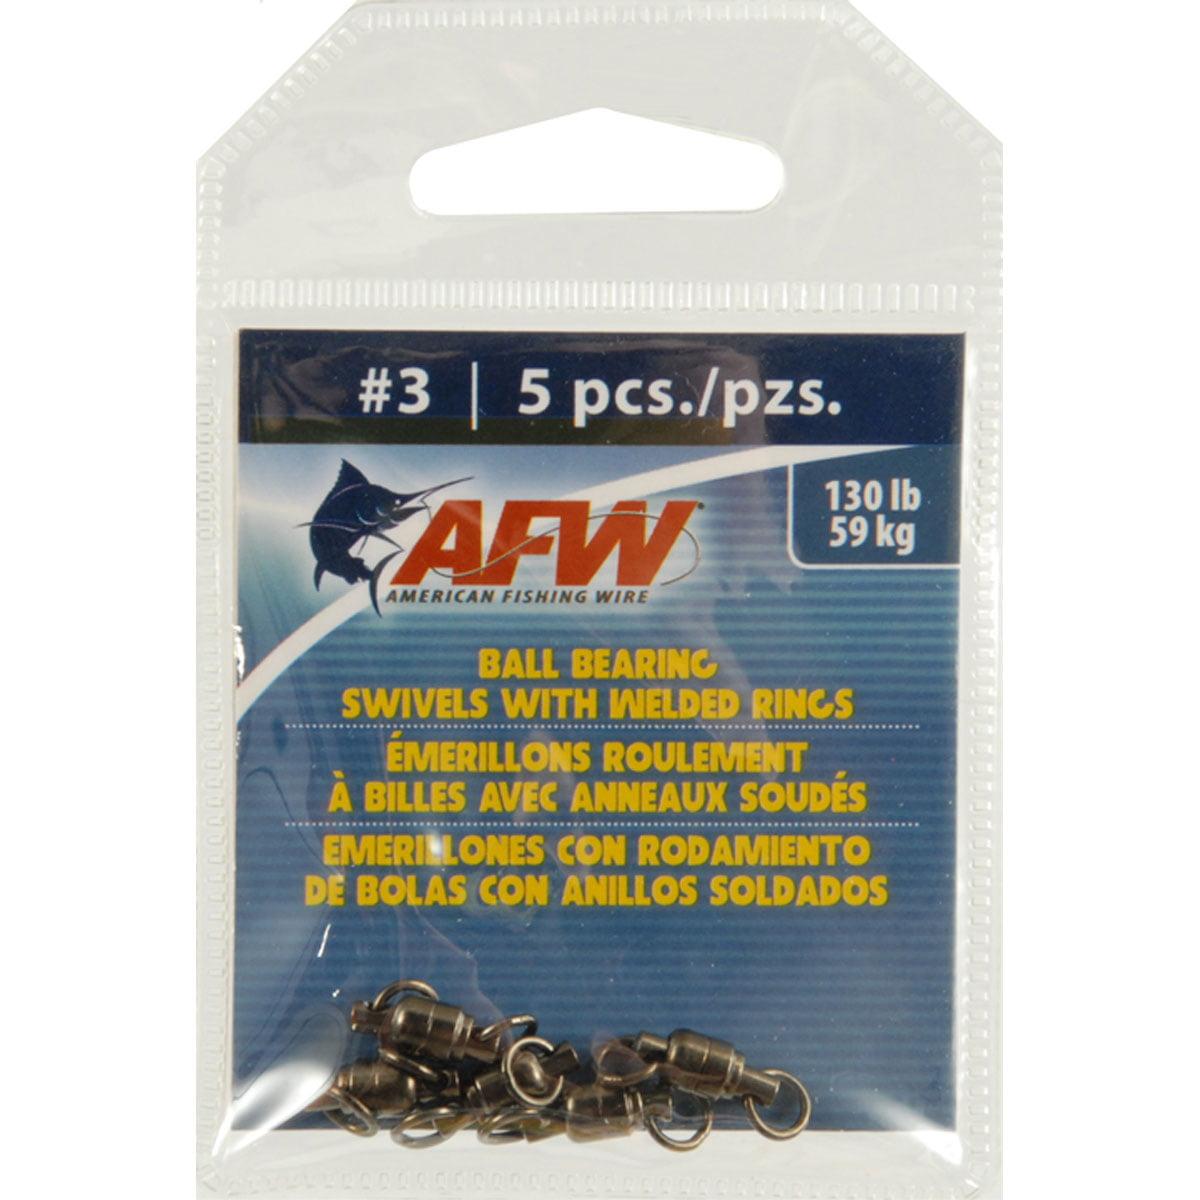 American Fishing Wire Ball Bearing Swivels 130# Black 5Pc - BH-BXRBC1284